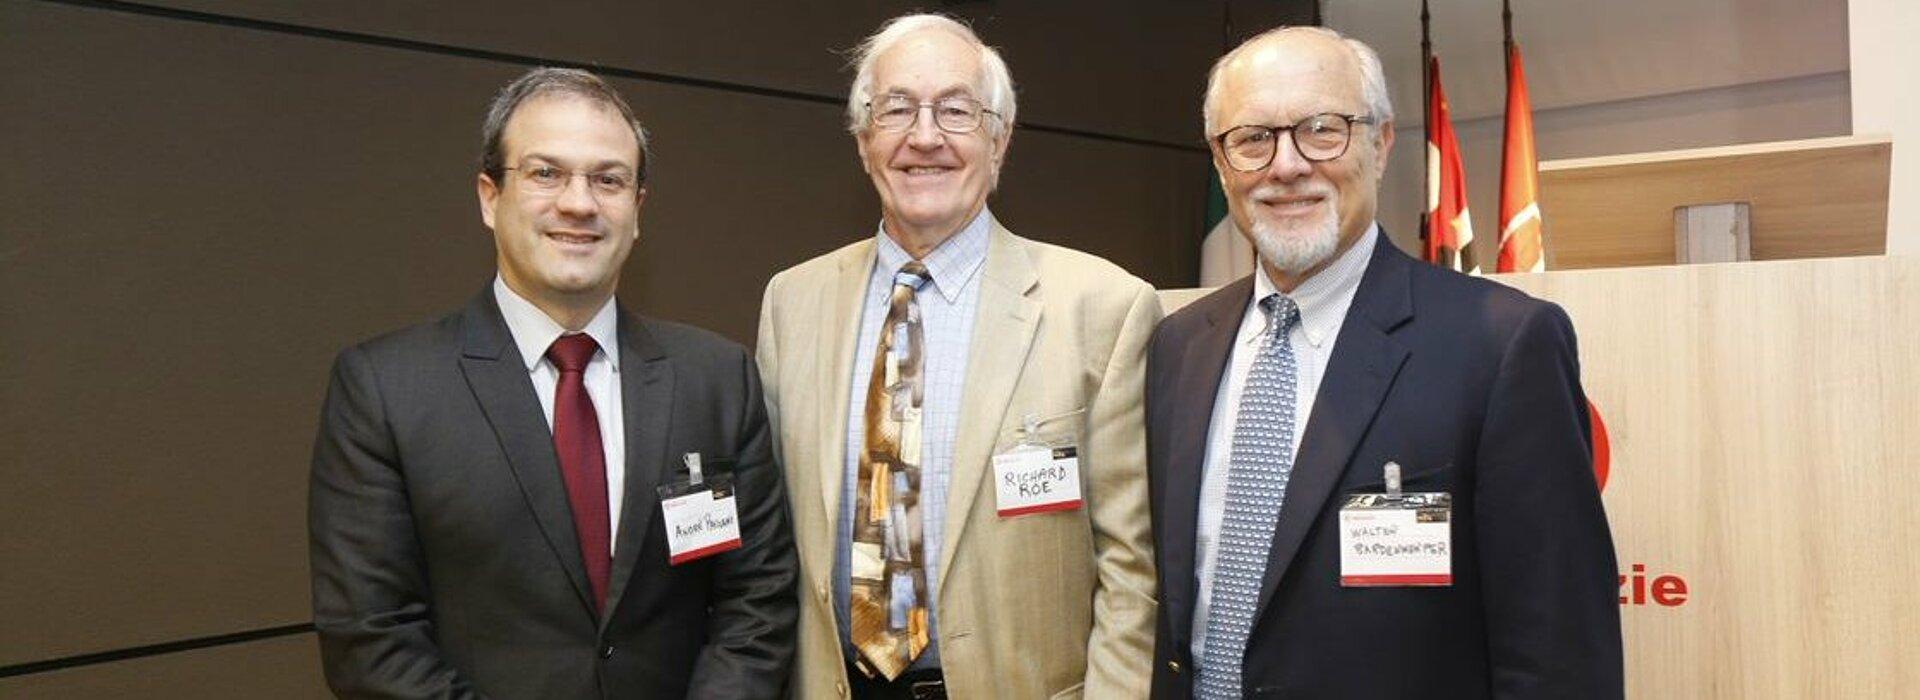 Da esquerda para a direita: André Pagani, Richard Roe e Walter Bardenwerper.